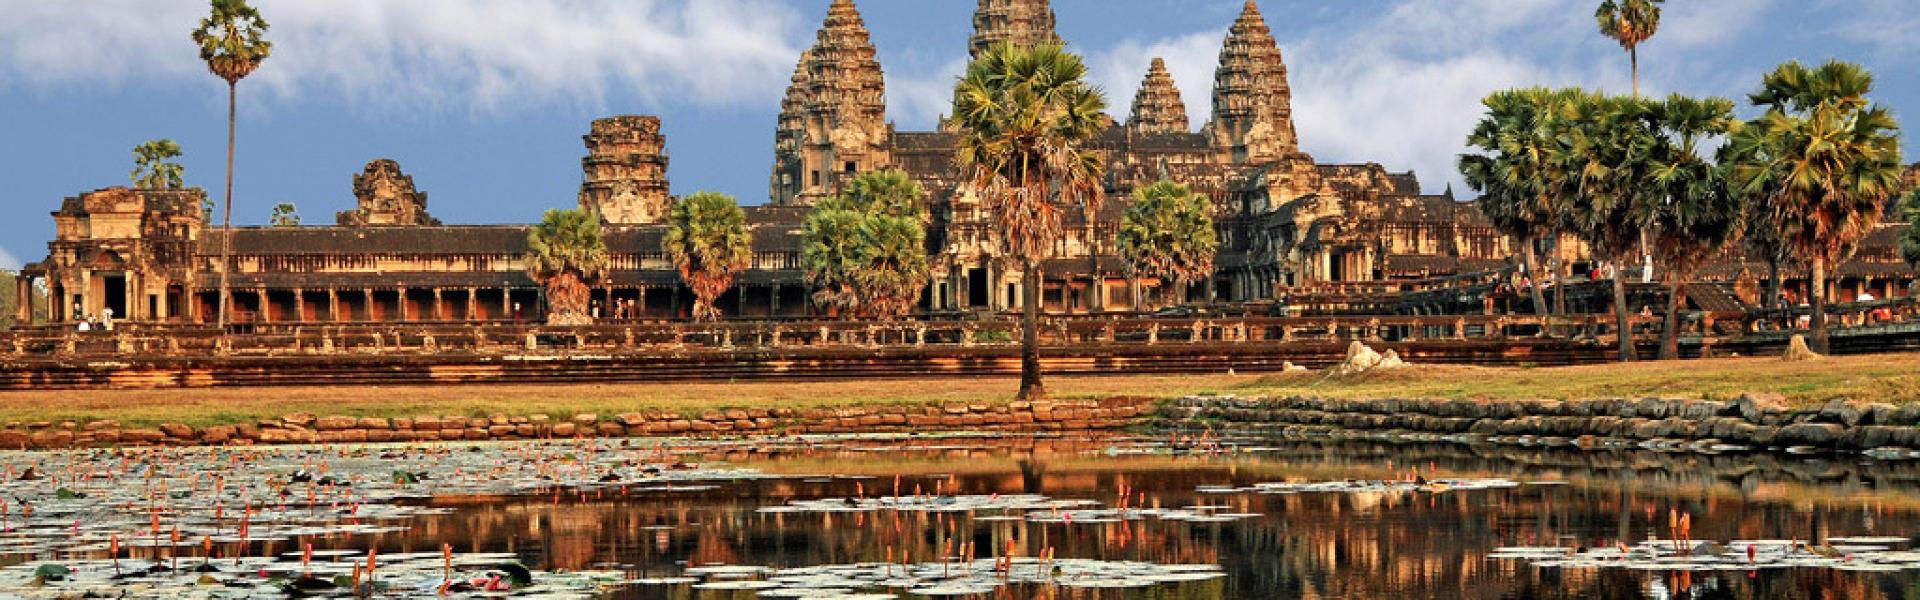 Cambodia - Asia Tour Advisor